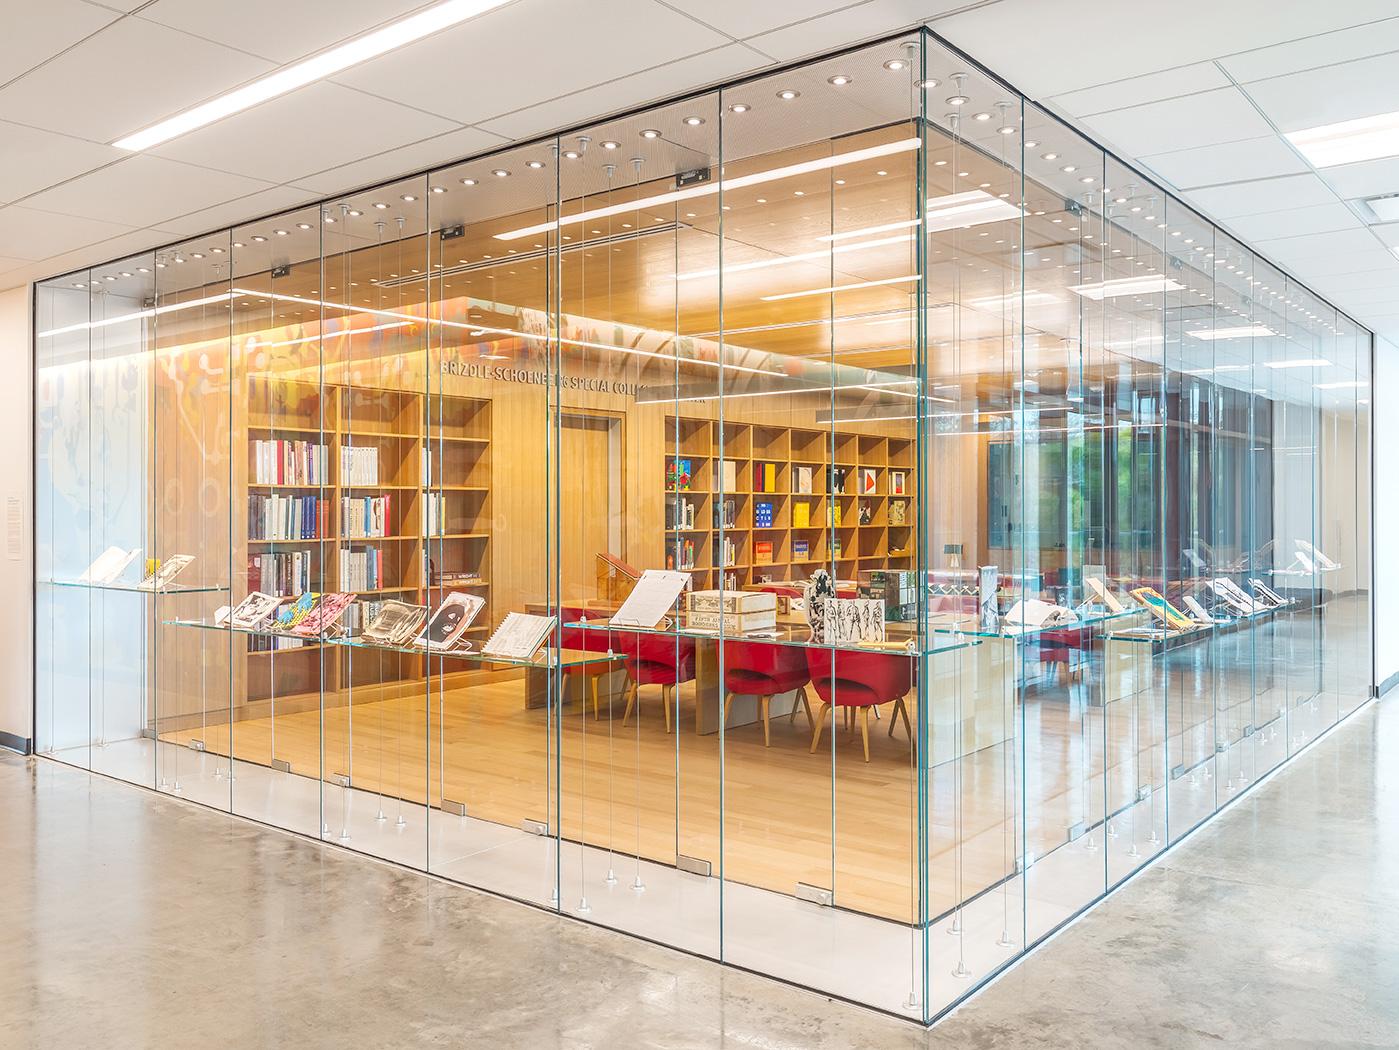 glass display area